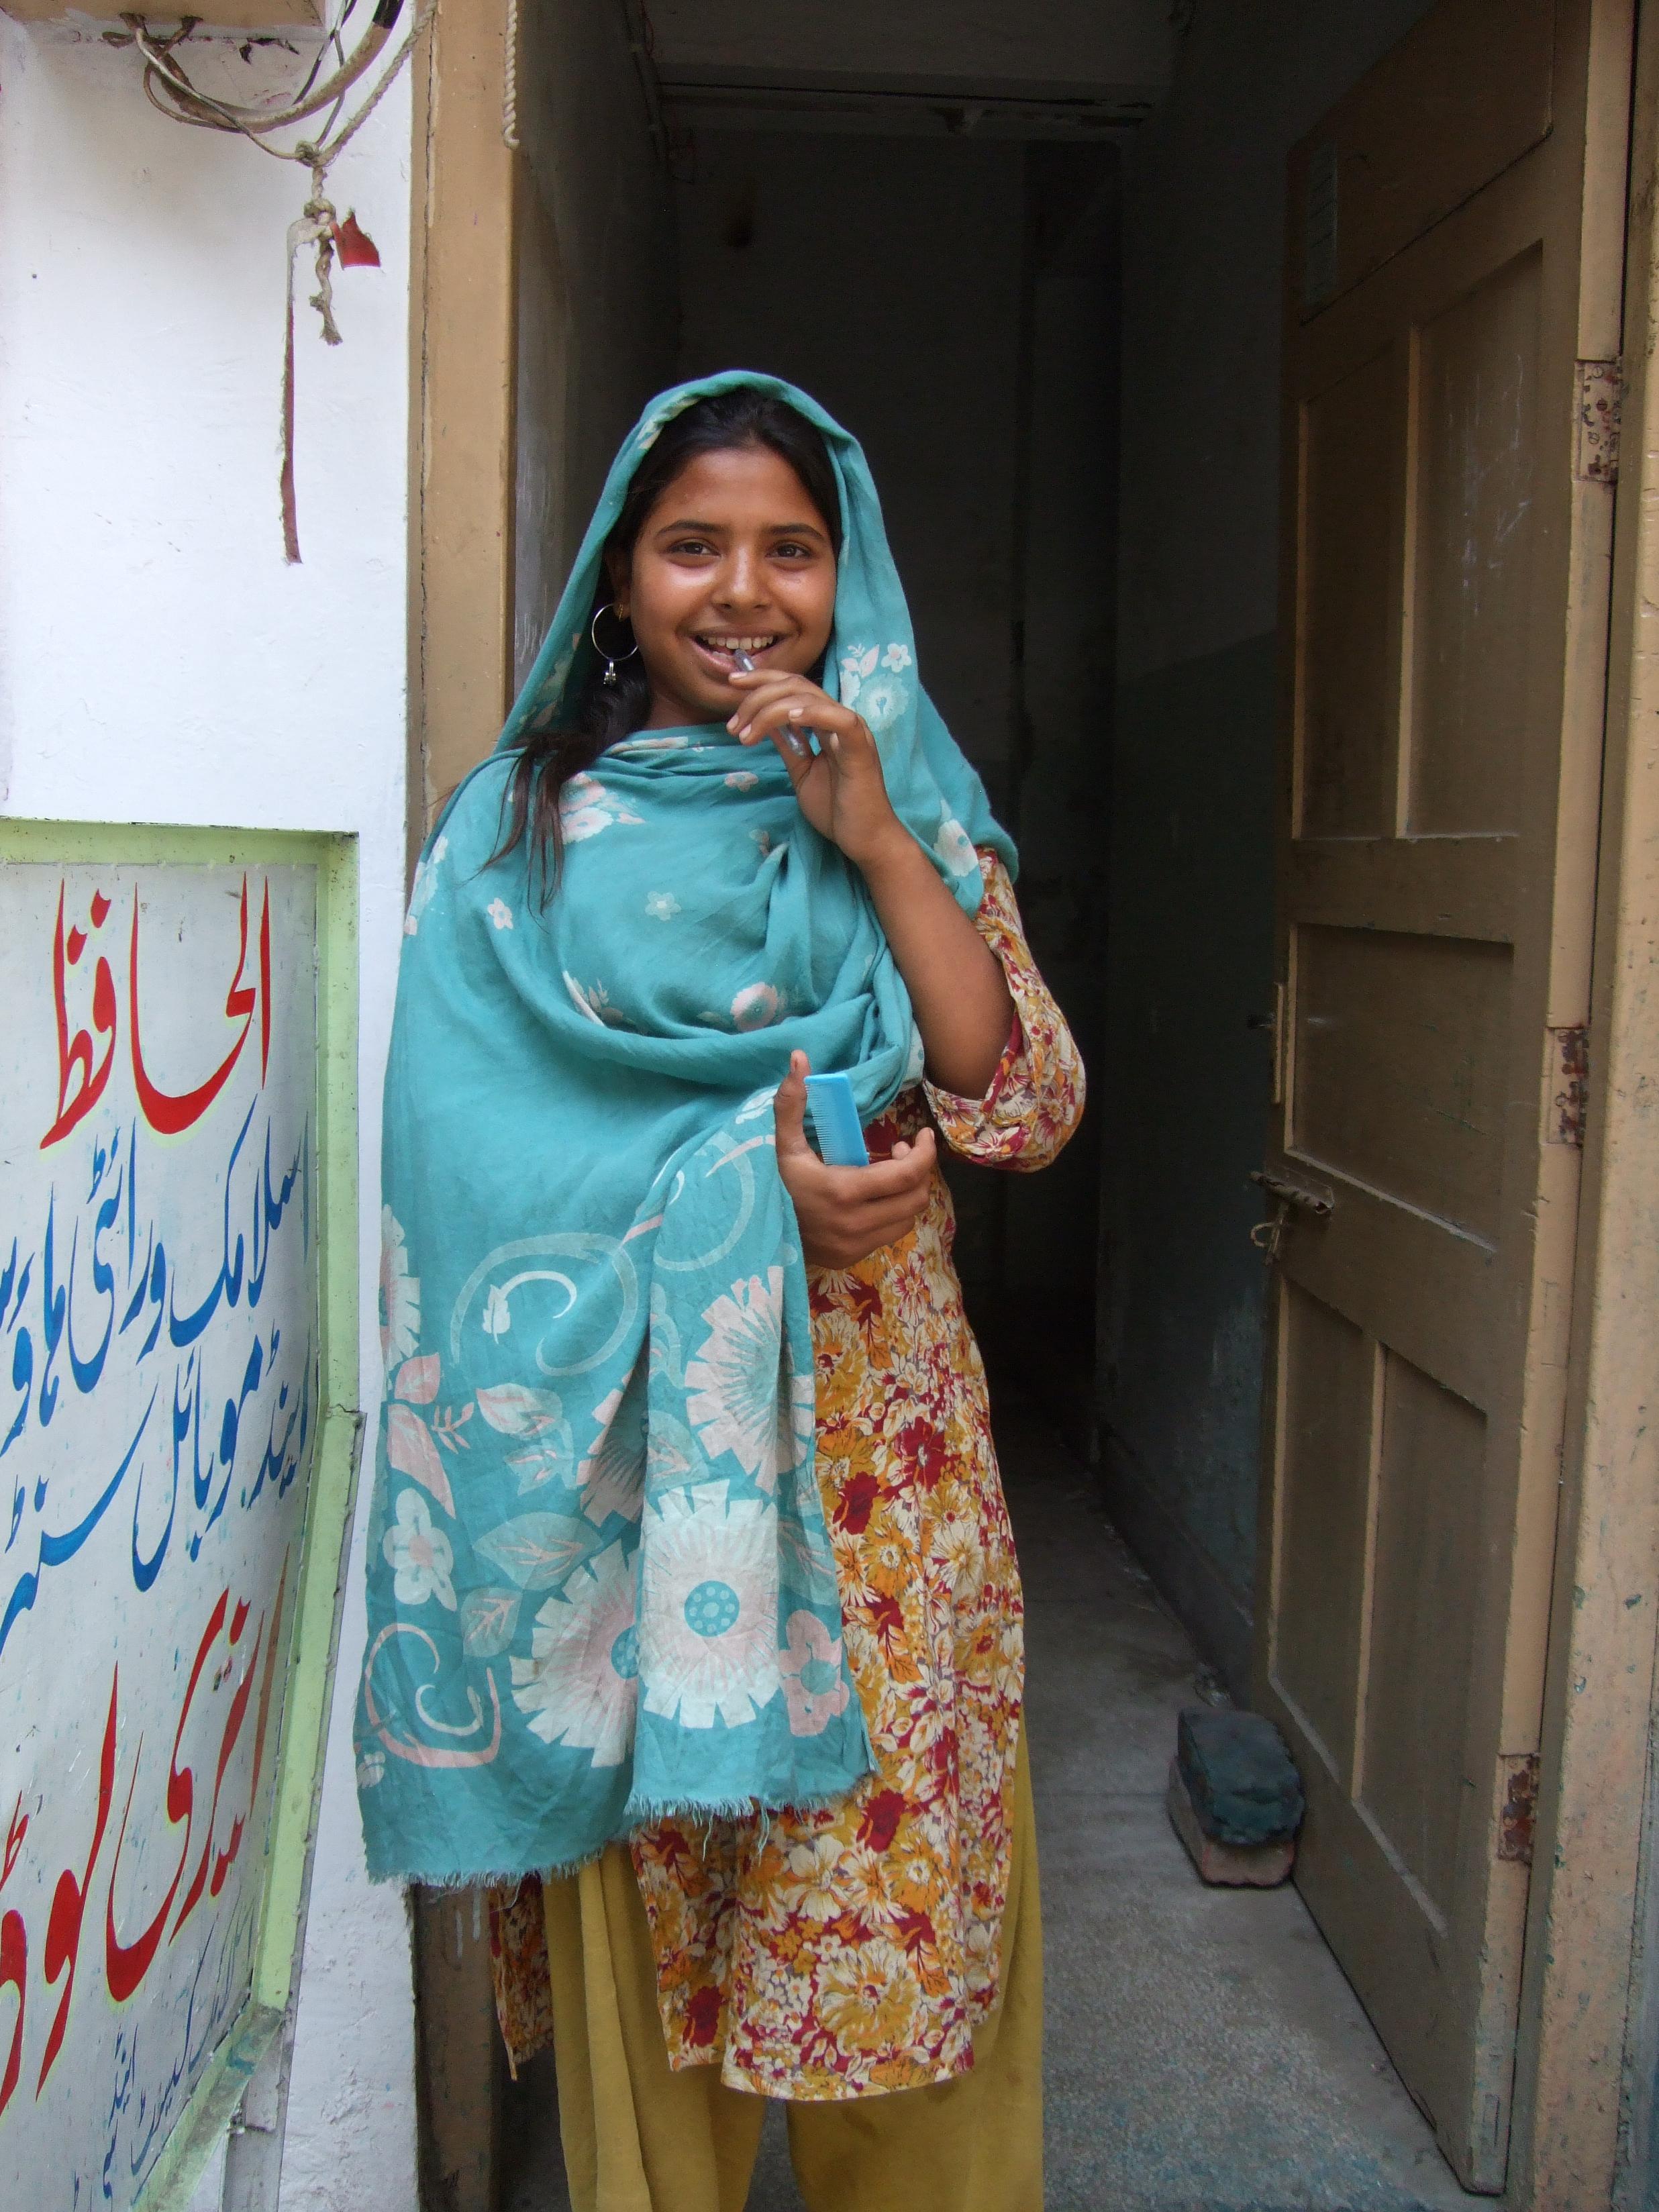 Congratulate, seems pakistanska flickor mobil sex